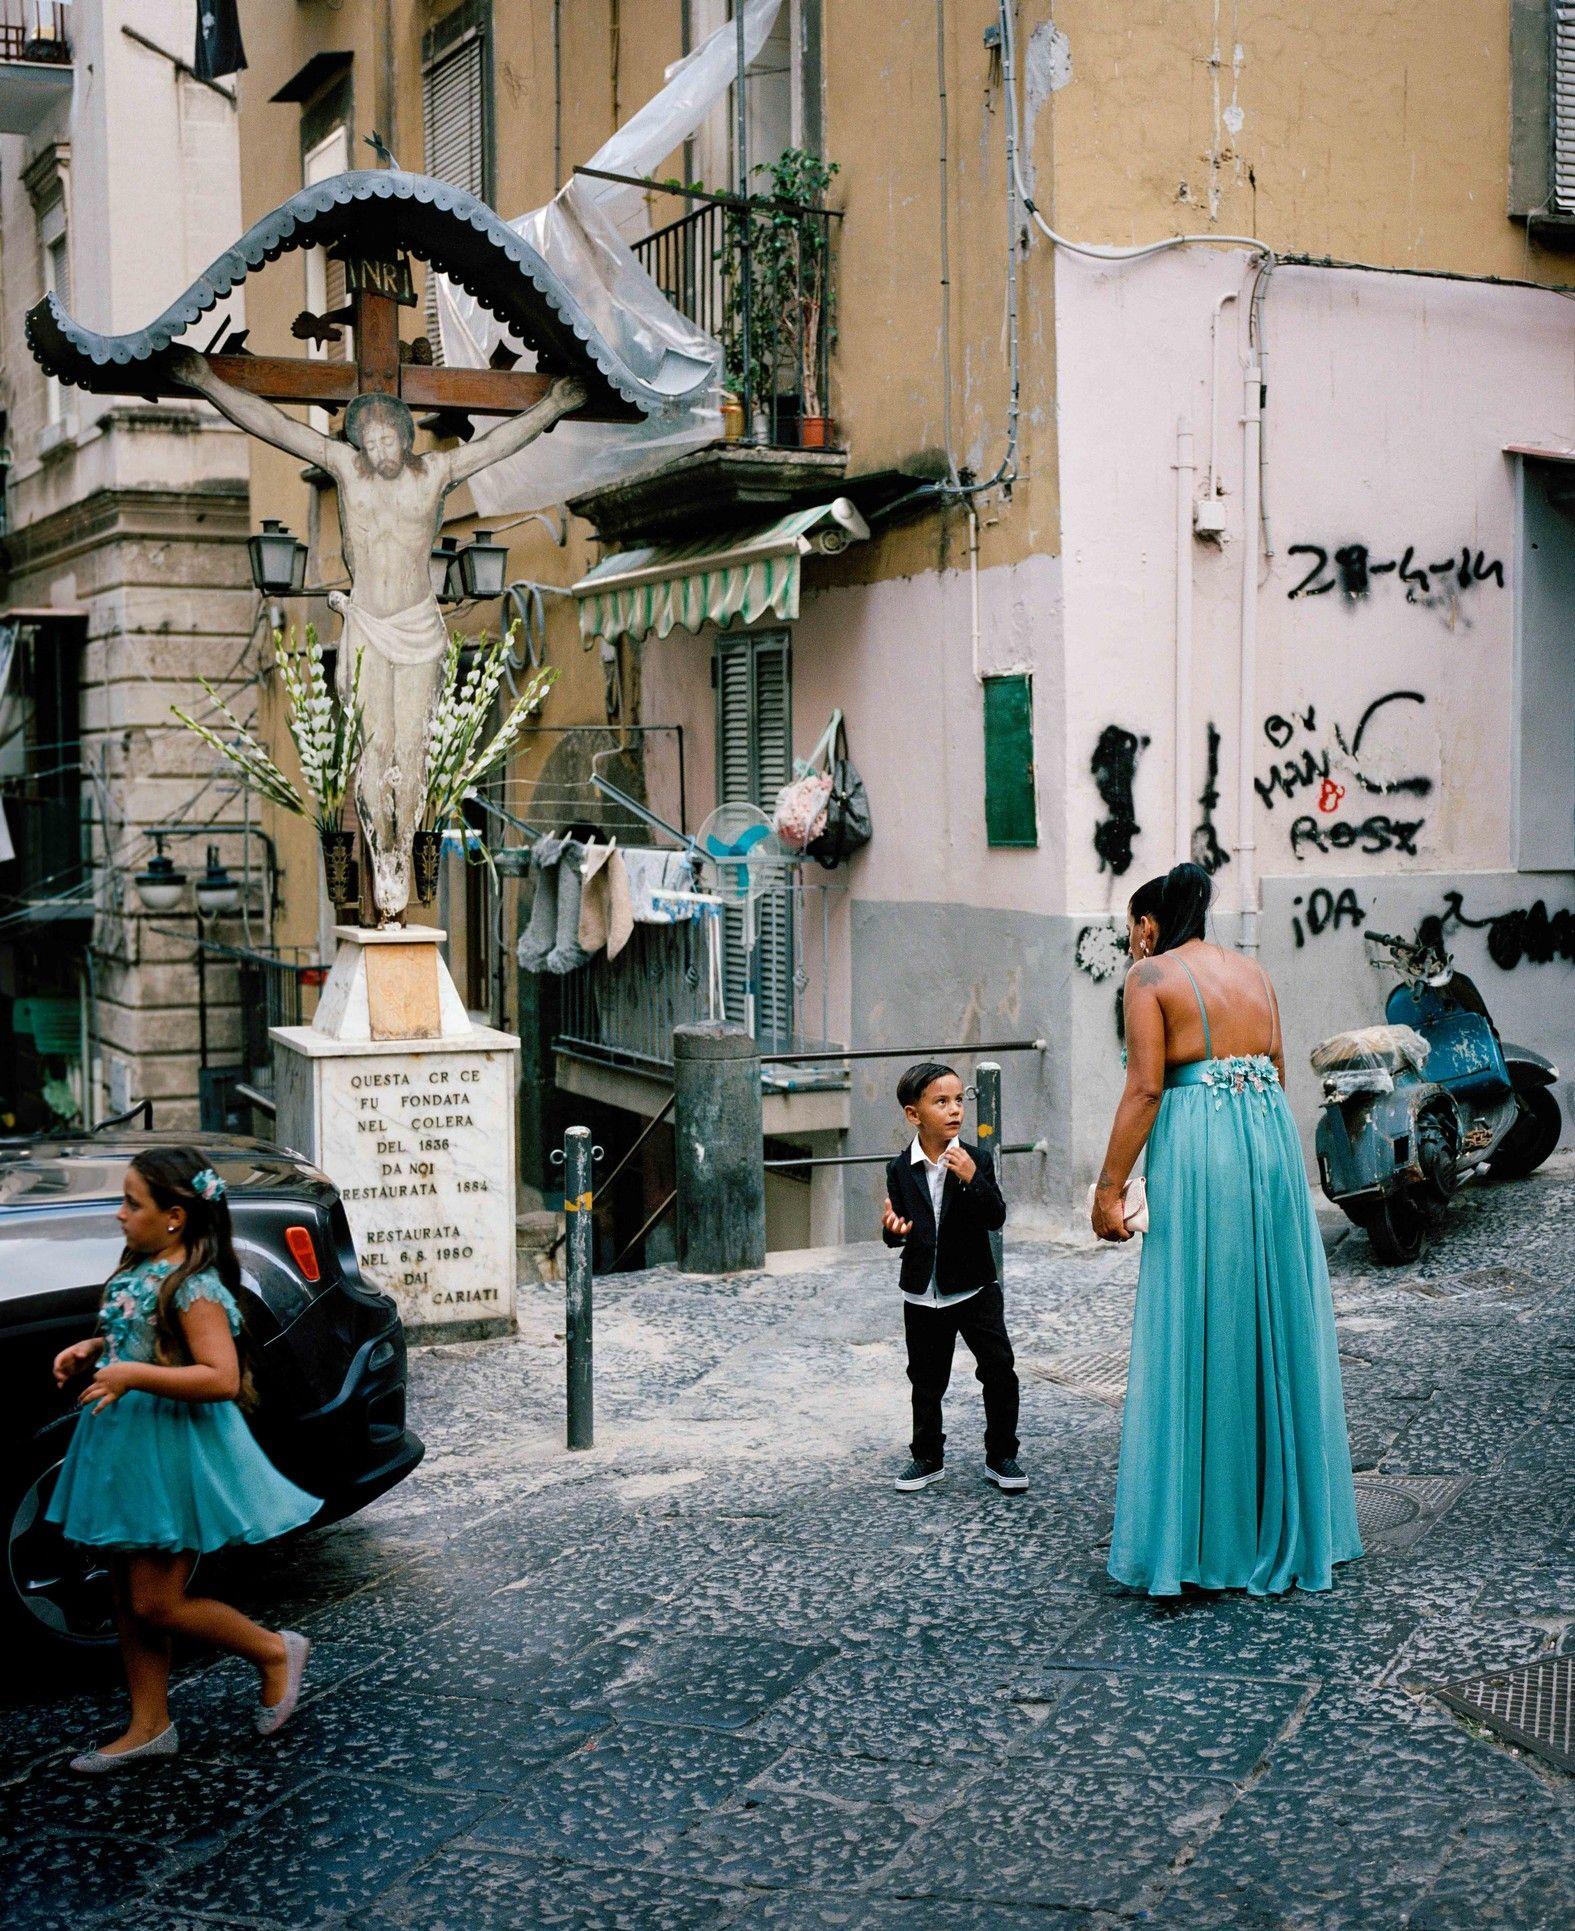 Naples Through The Eyes Of A British Photographer (con